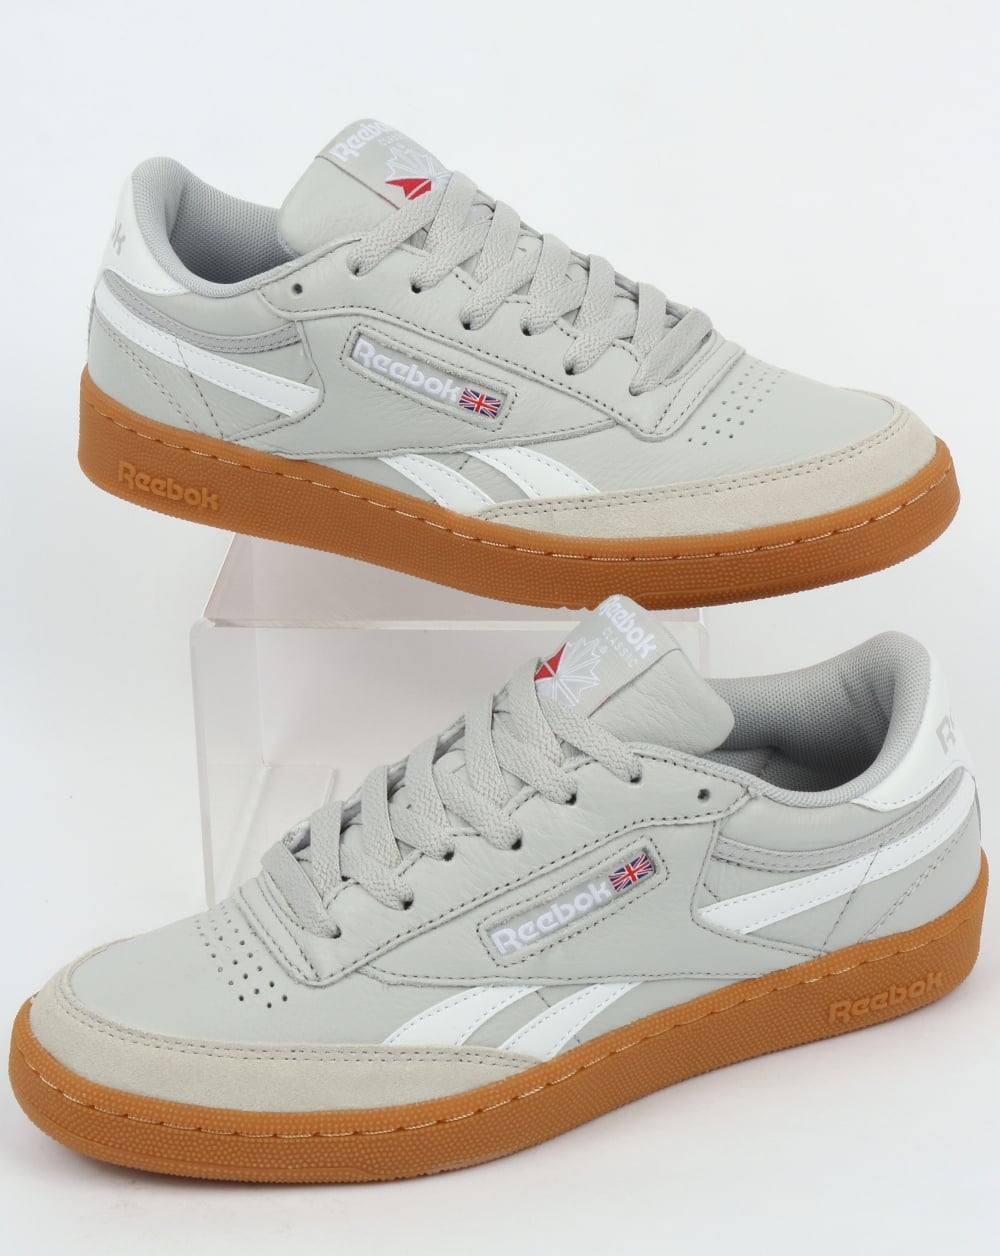 7428a654ac608 Reebok Reebok Revenge Plus Gum Trainers Skull Grey White